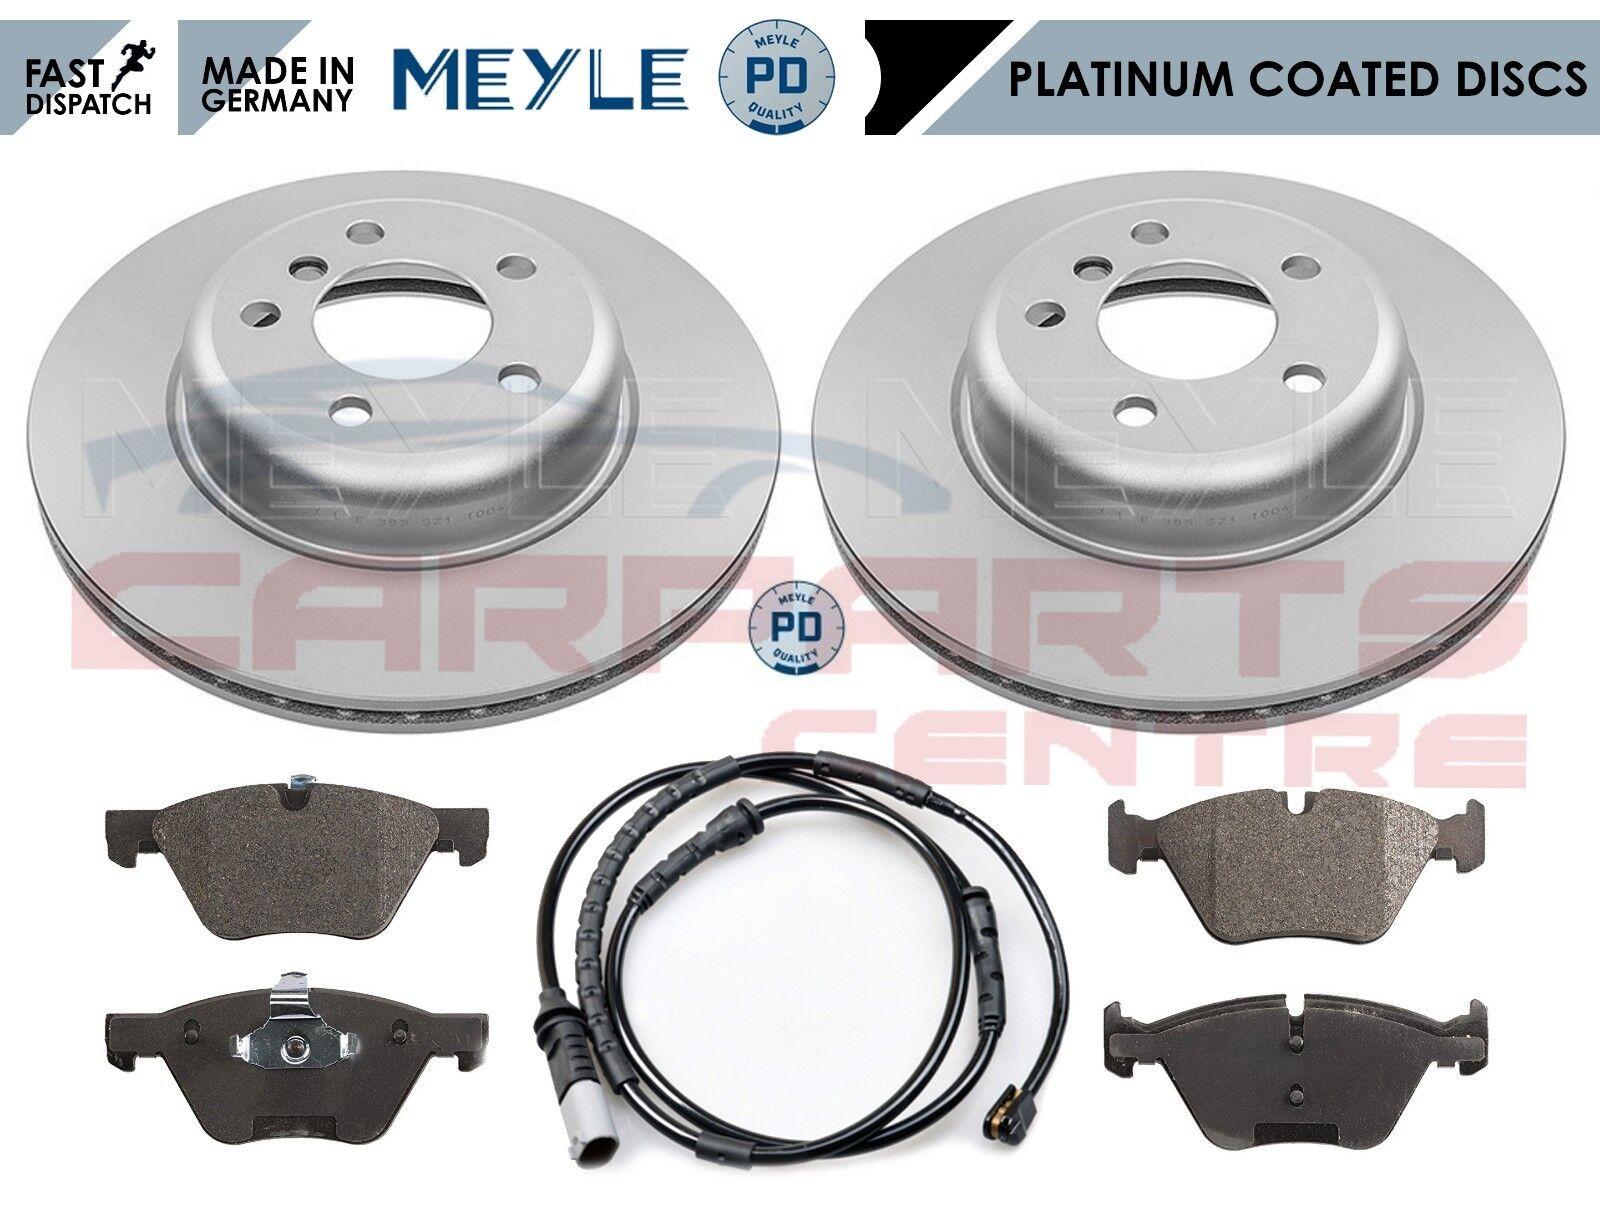 FOR BMW 5 SERIES E39 FRONT REAR MEYLE PLATINUM BRAKE DISCS PAD SET HAND SHOES